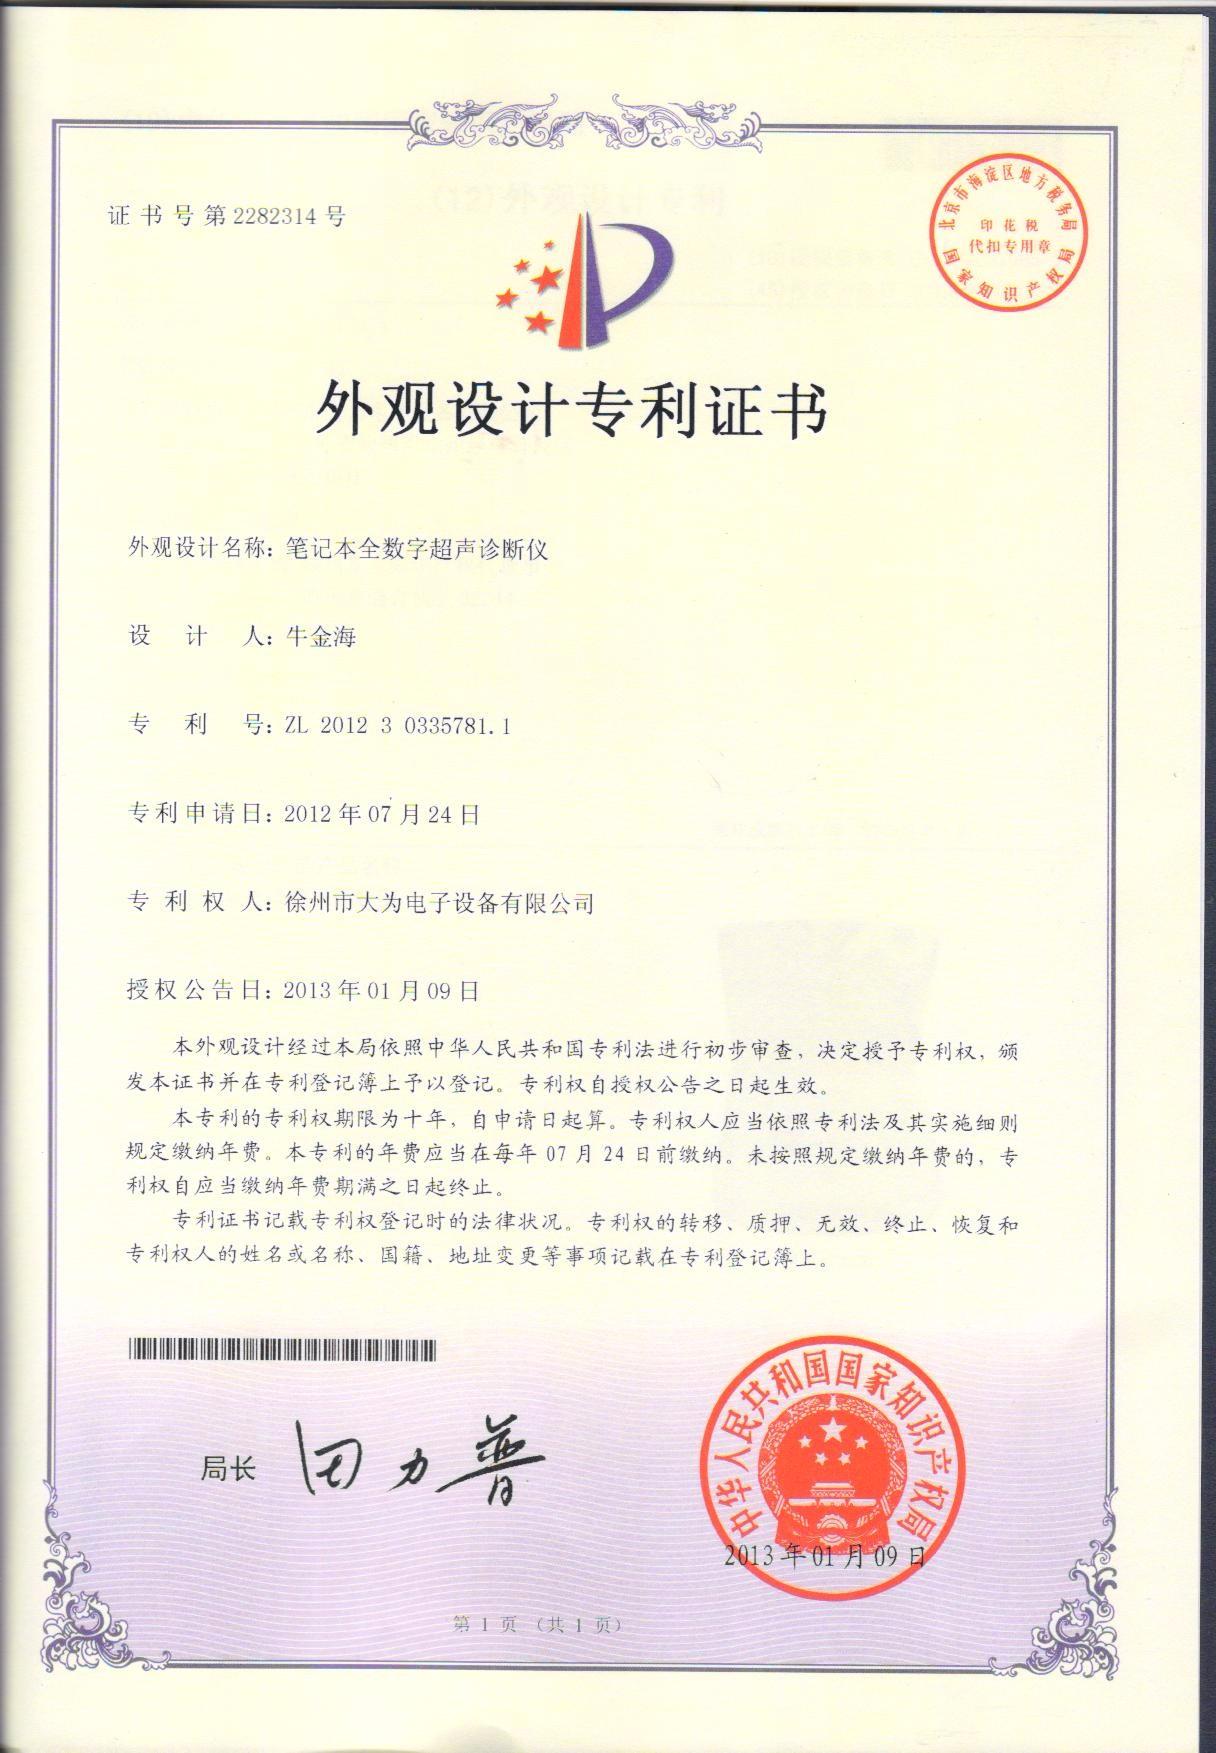 Latters Patent Certificate